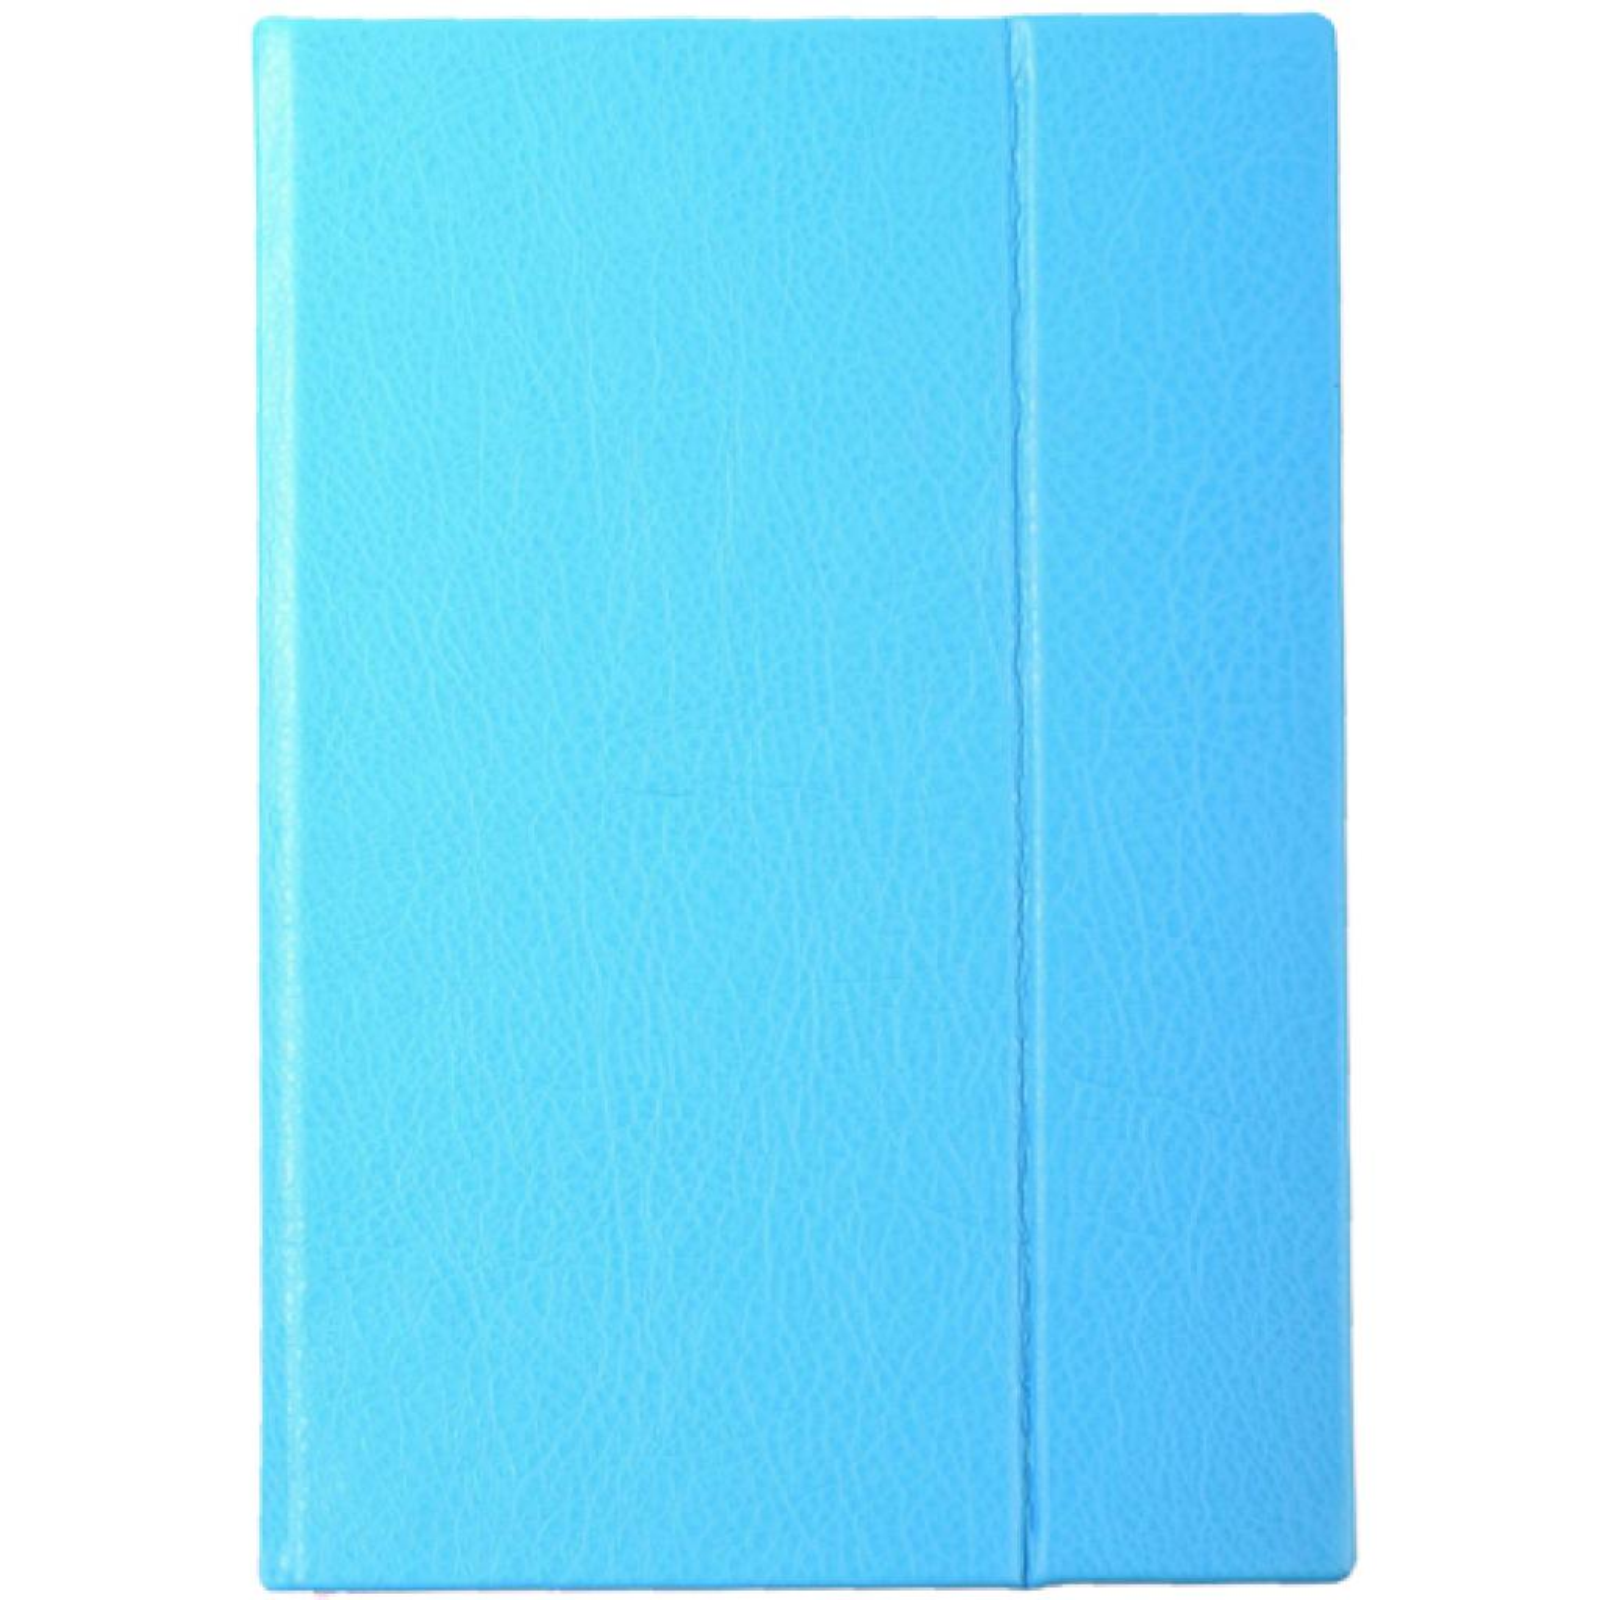 Чехол для планшета Vento 9 Desire Bright -blue изображение 2